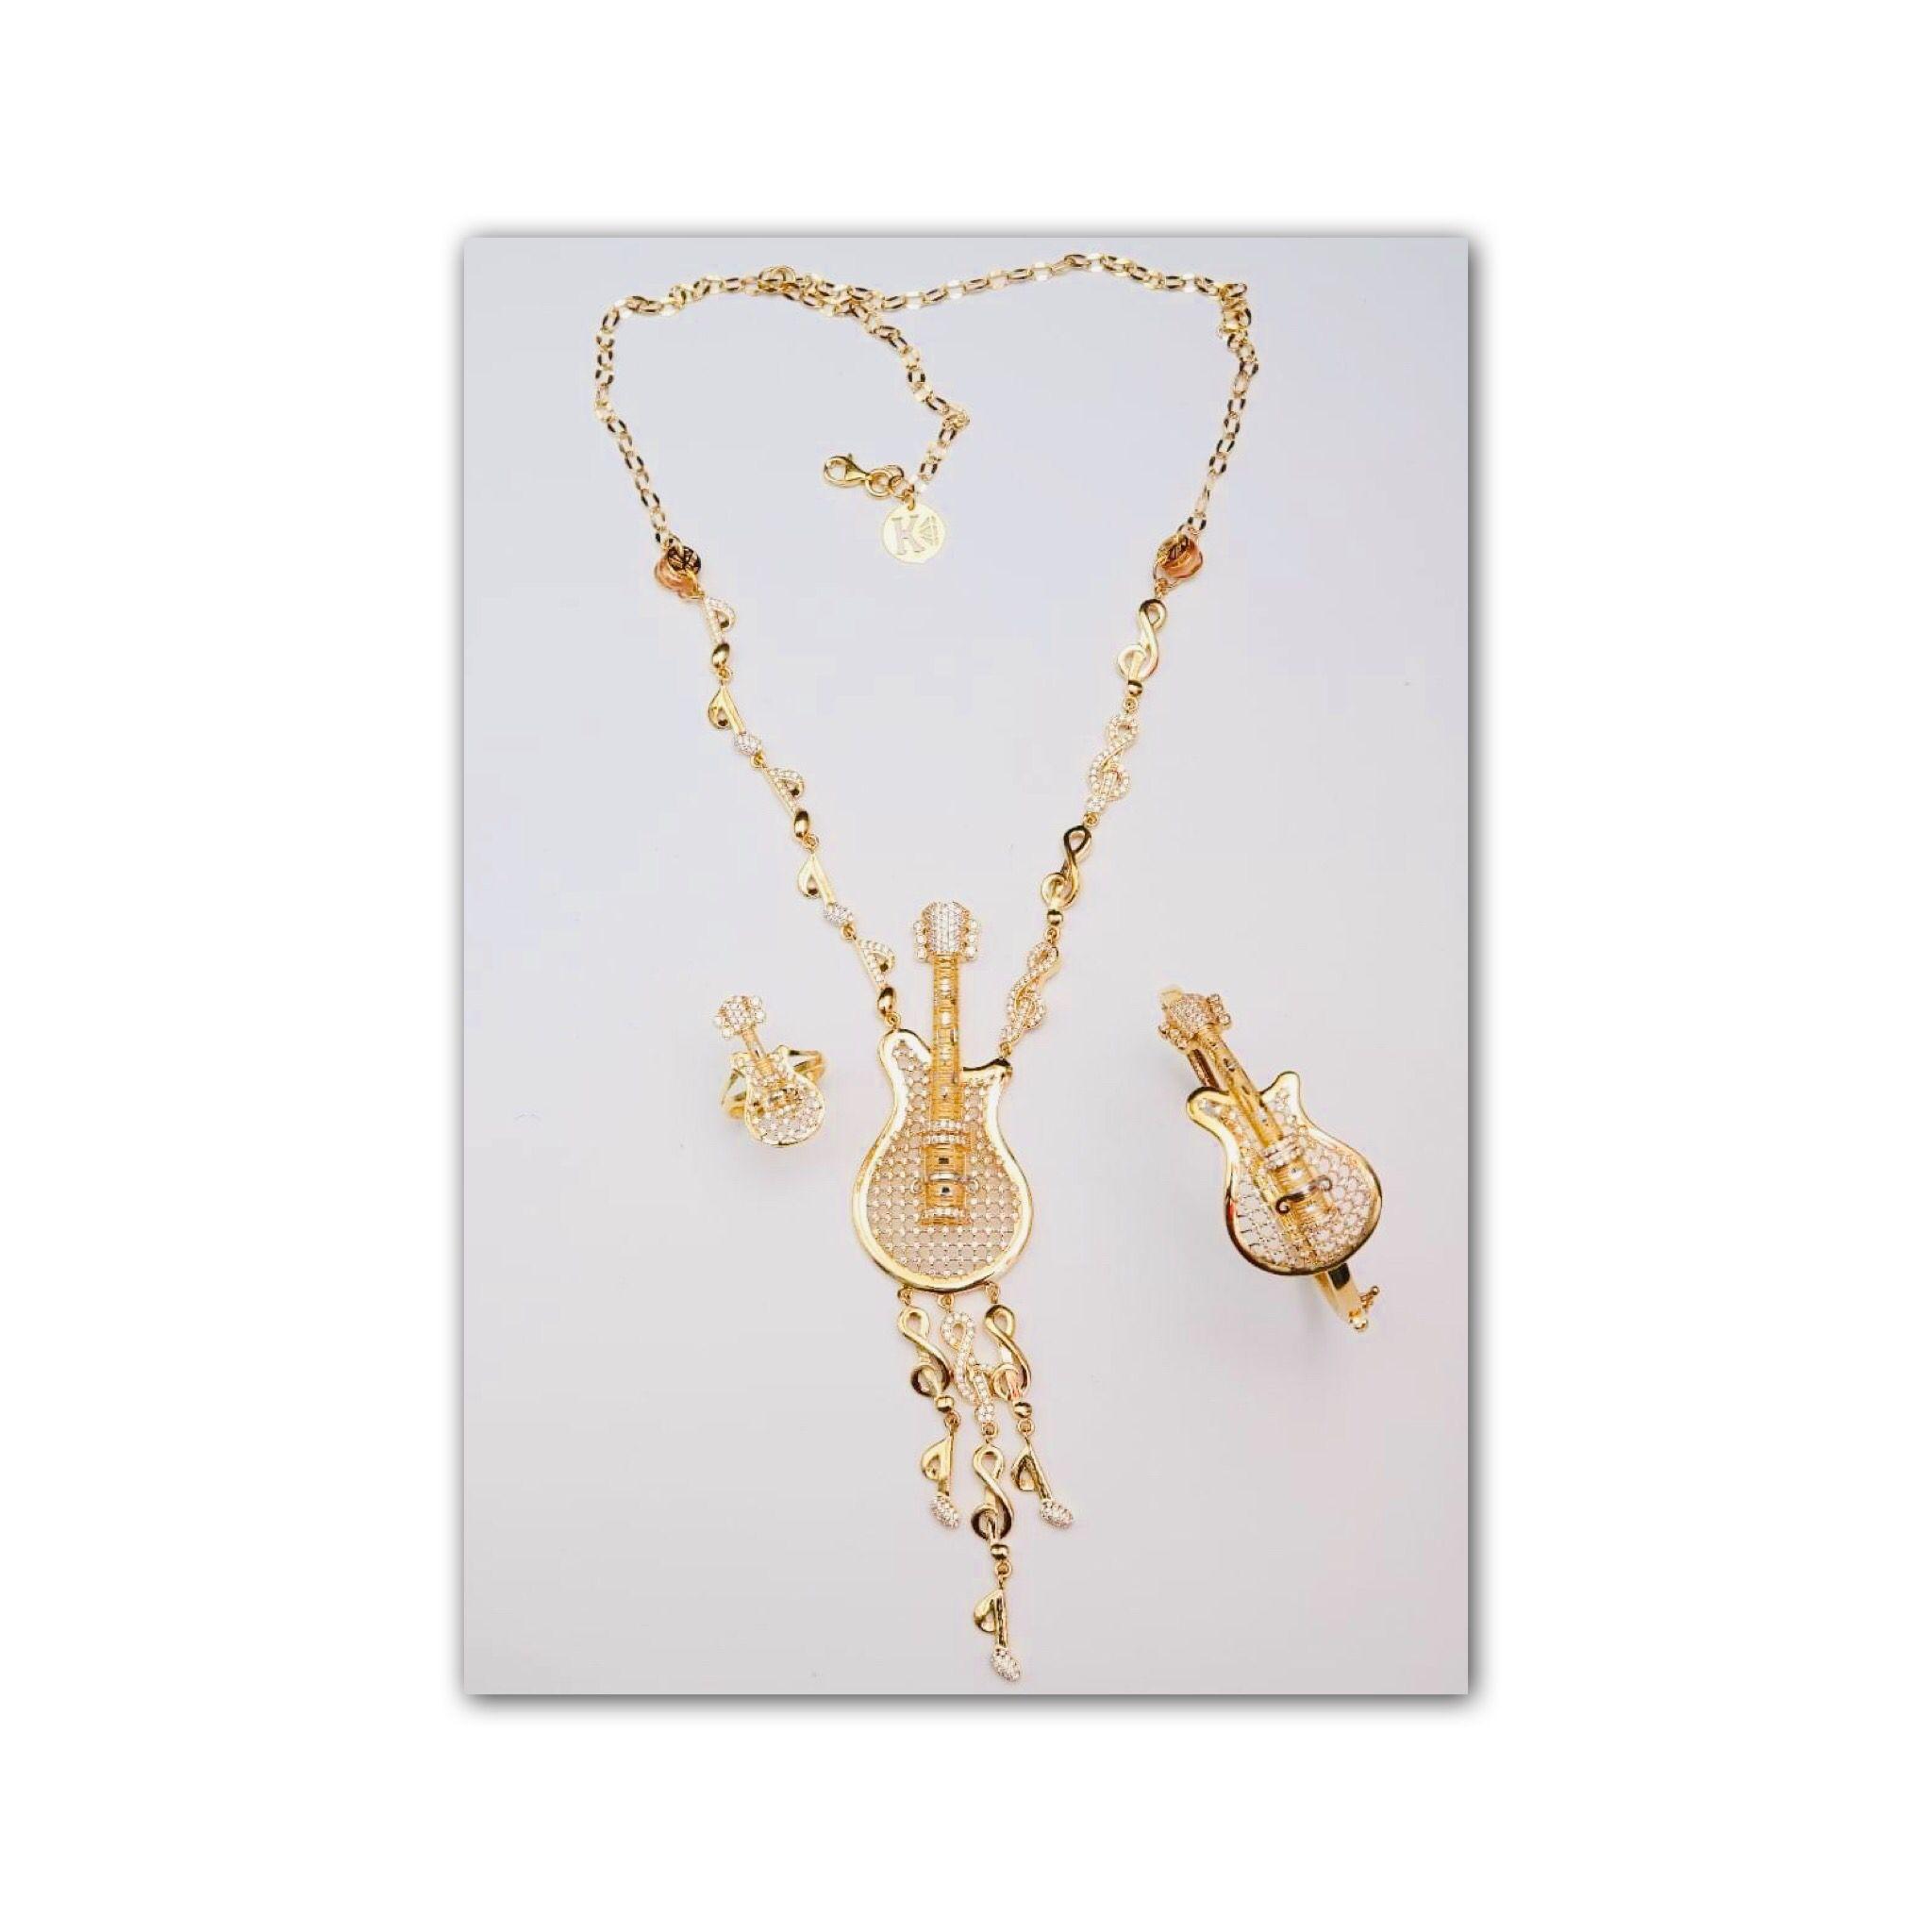 Isagha نصف طقم ذهب عيار 21 Gold Necklace Gold Jewelry